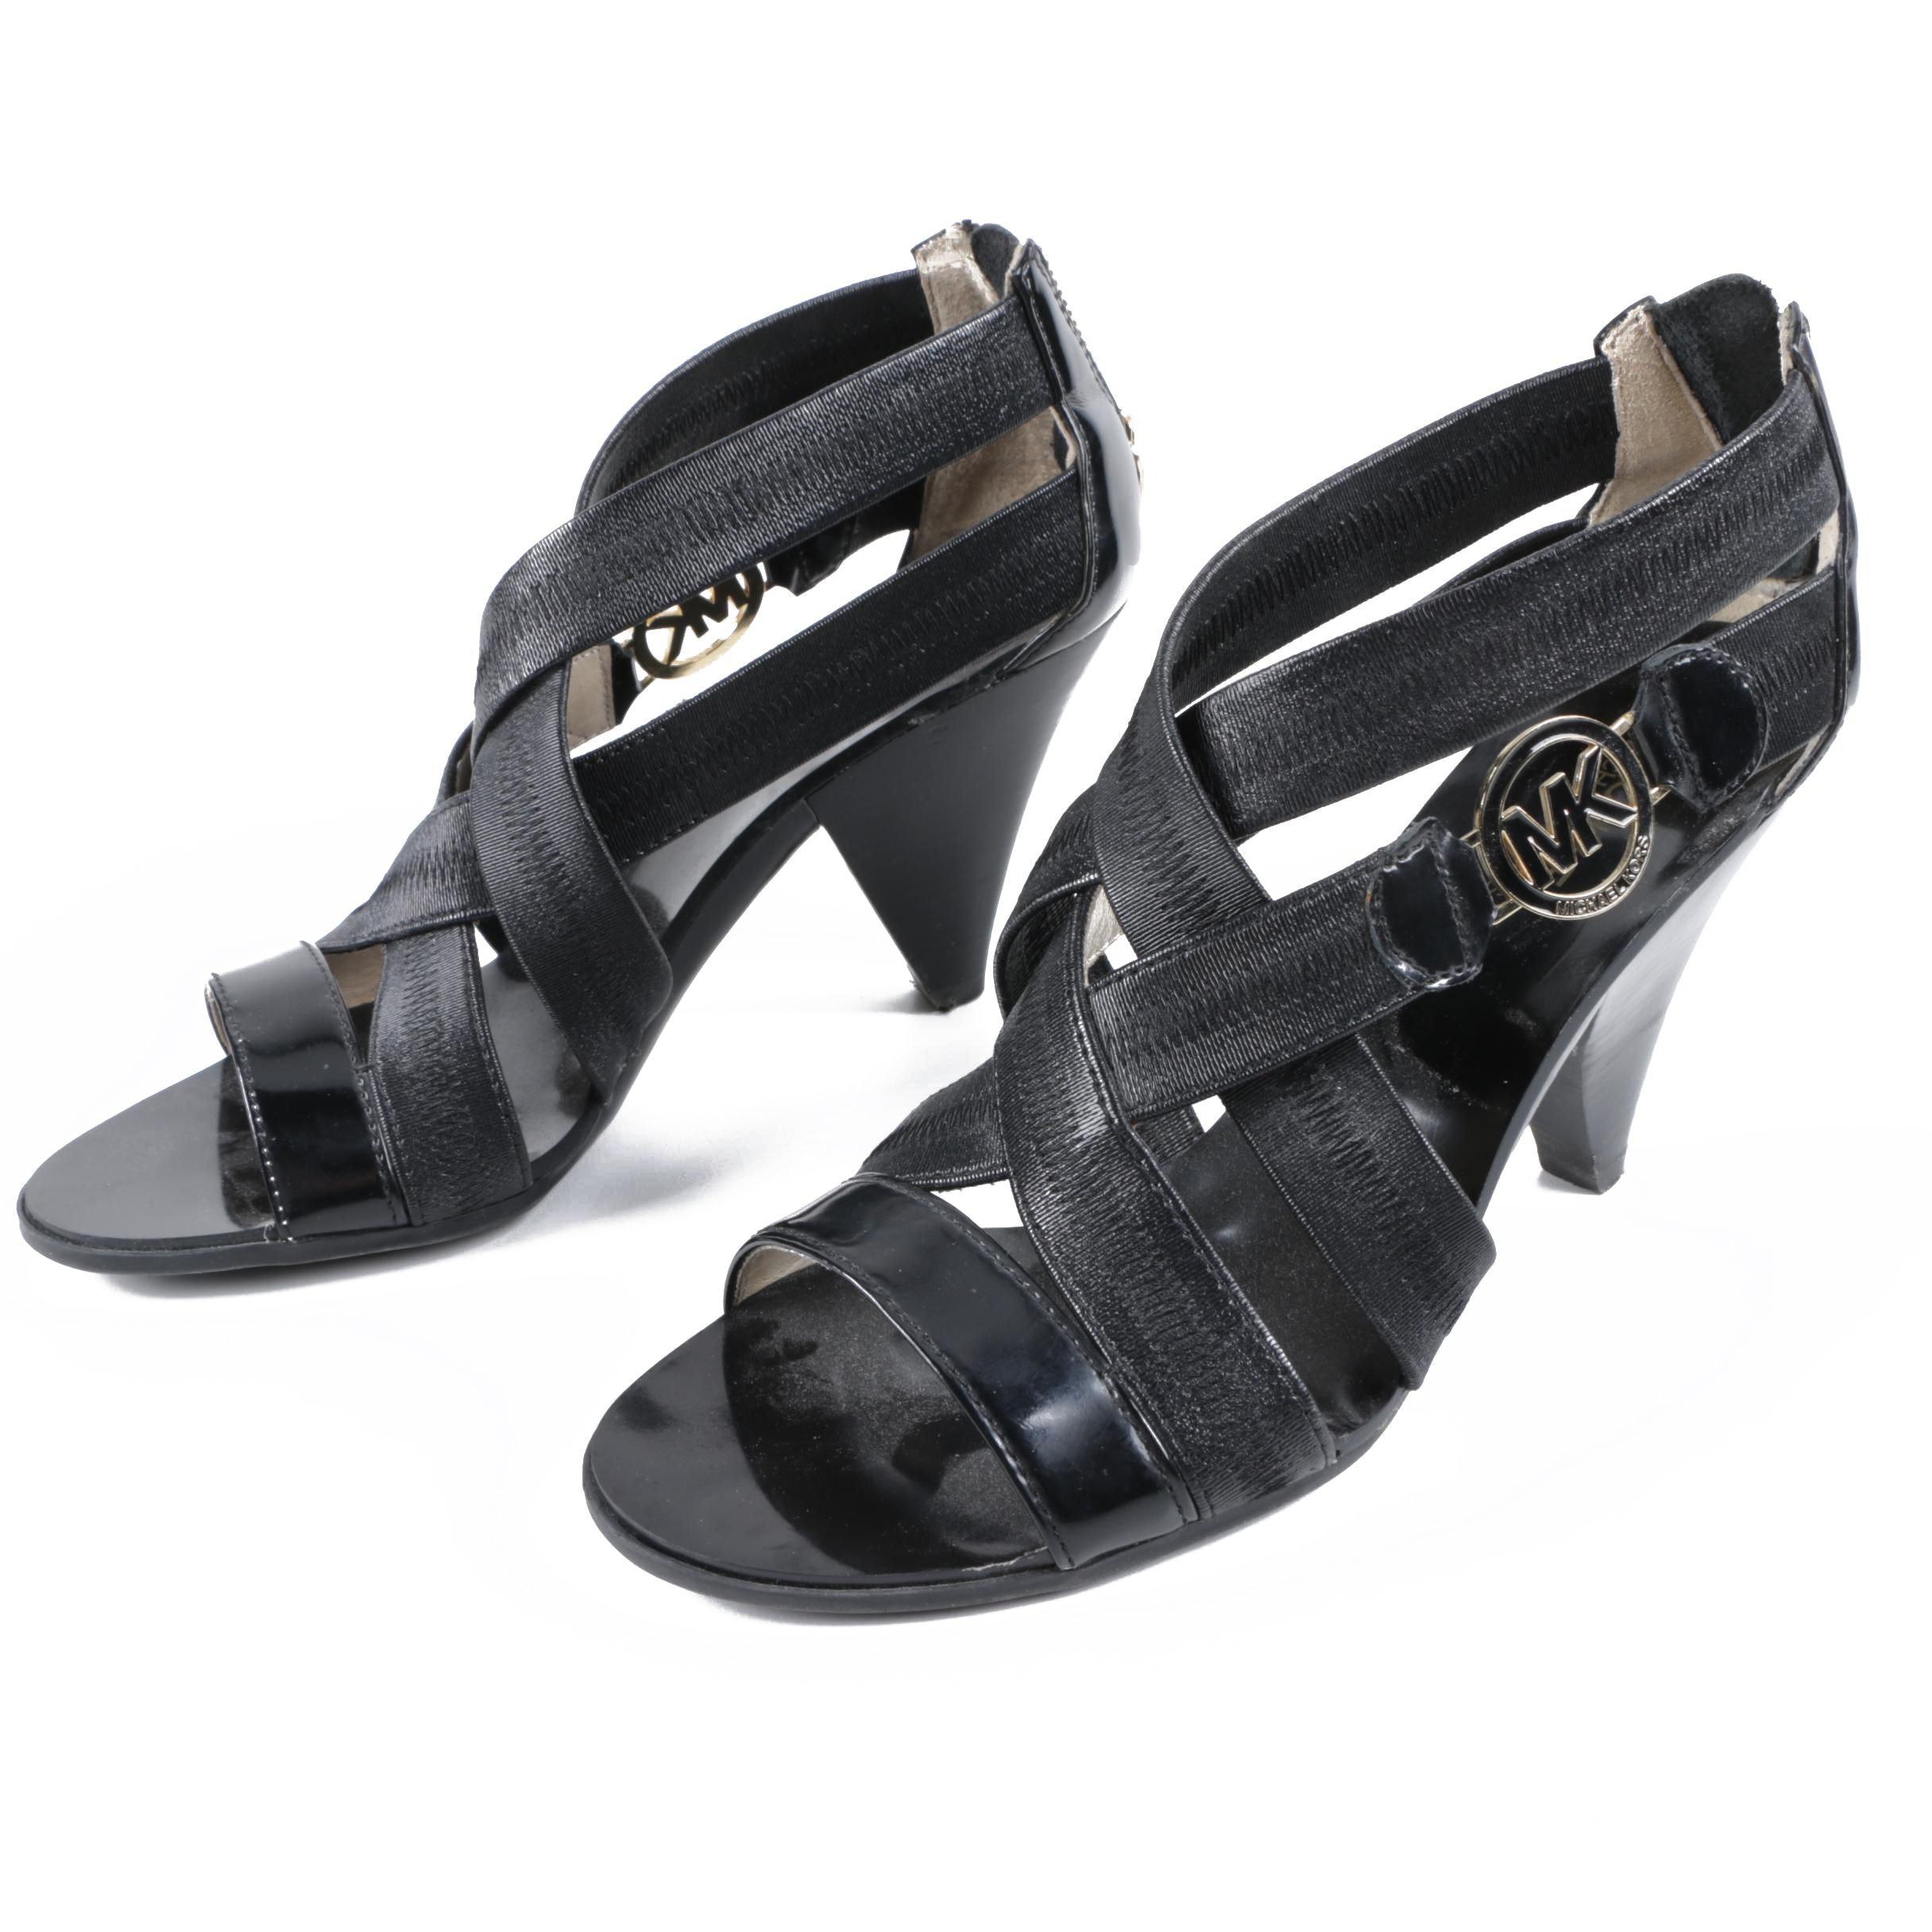 MICHAEL Michael Kors Heeled Sandals